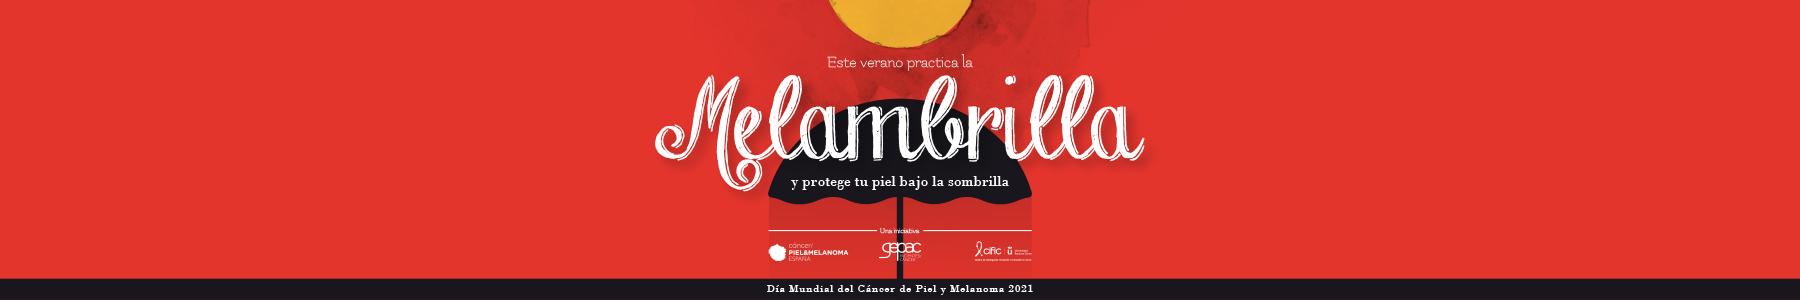 banners_dm_cáncer_de_piel_y_melanoma_2021_webaeal